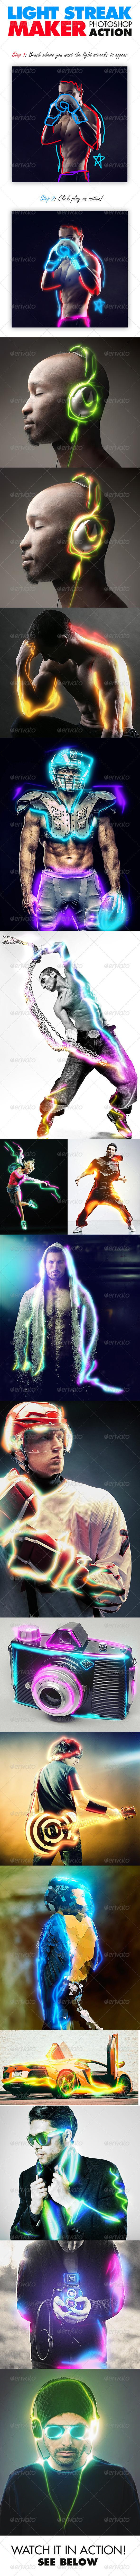 GraphicRiver Light Streak Maker Photoshop Action 8079690